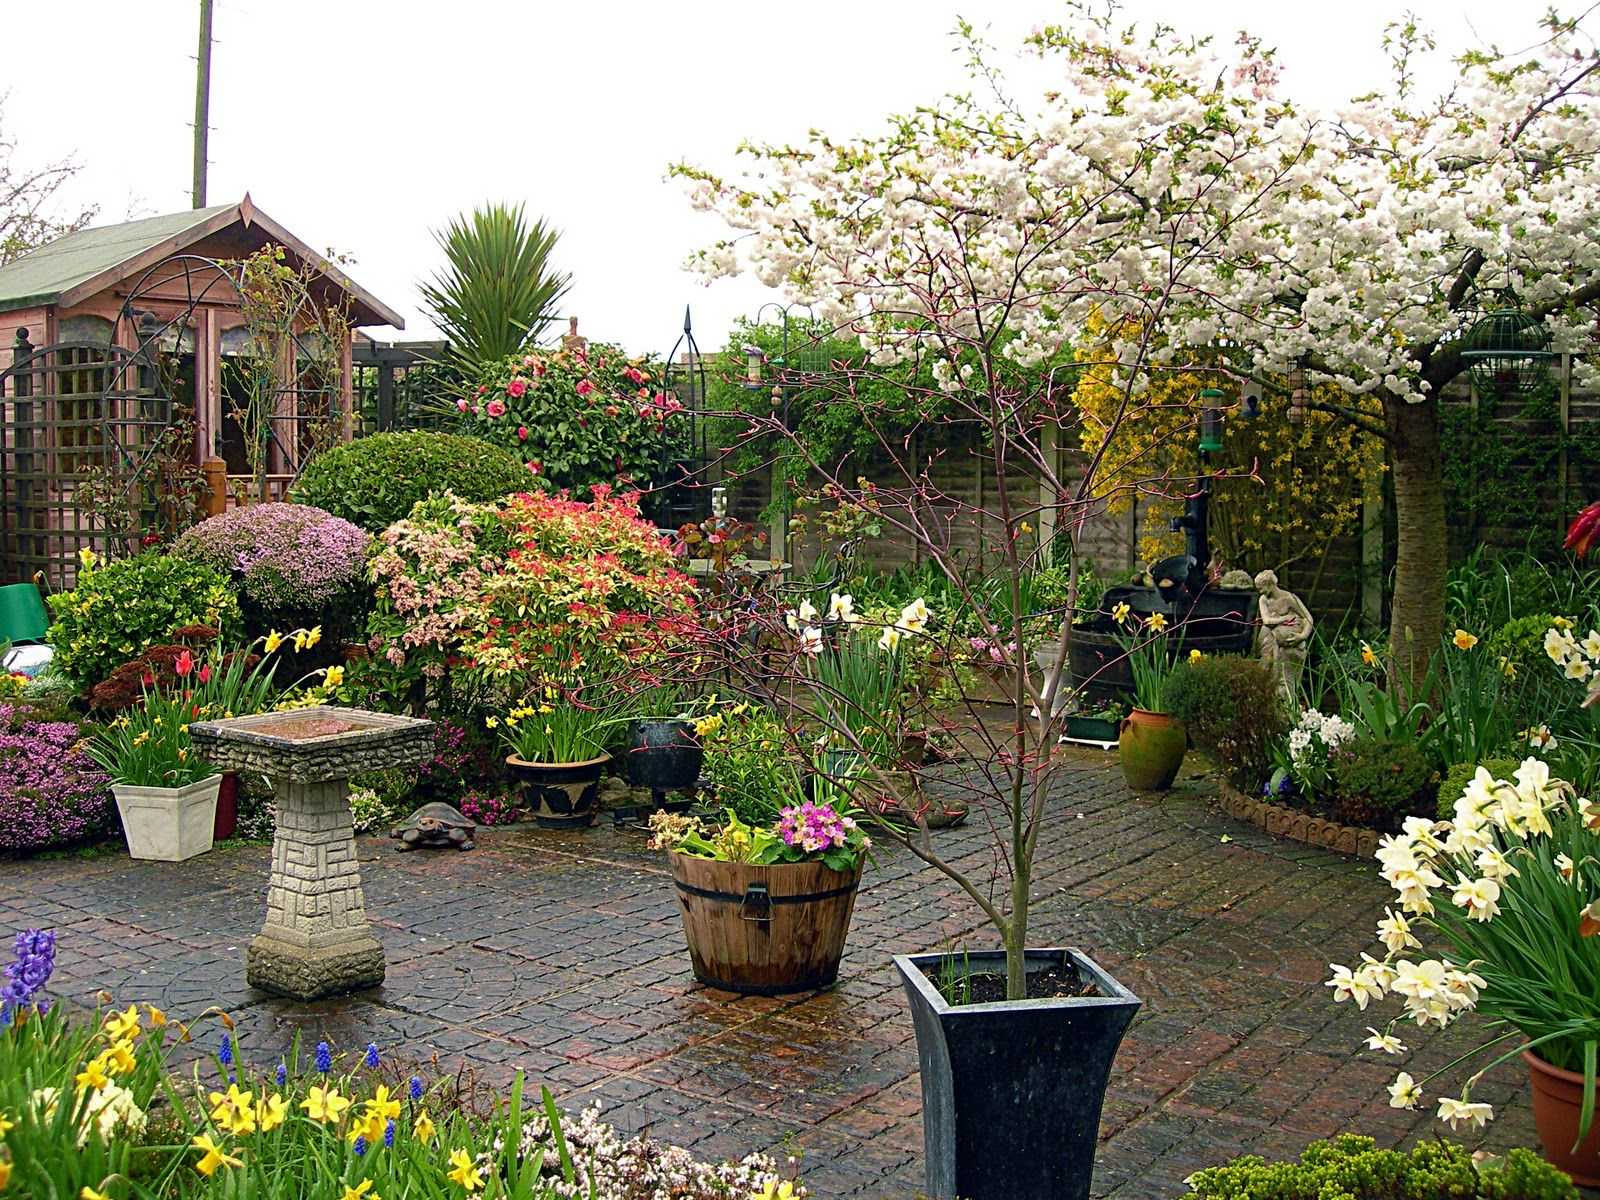 Beautiful home flower gardens - Beautiful Home Gardens Back Home To Relax In My Beautiful Home And Garden With My